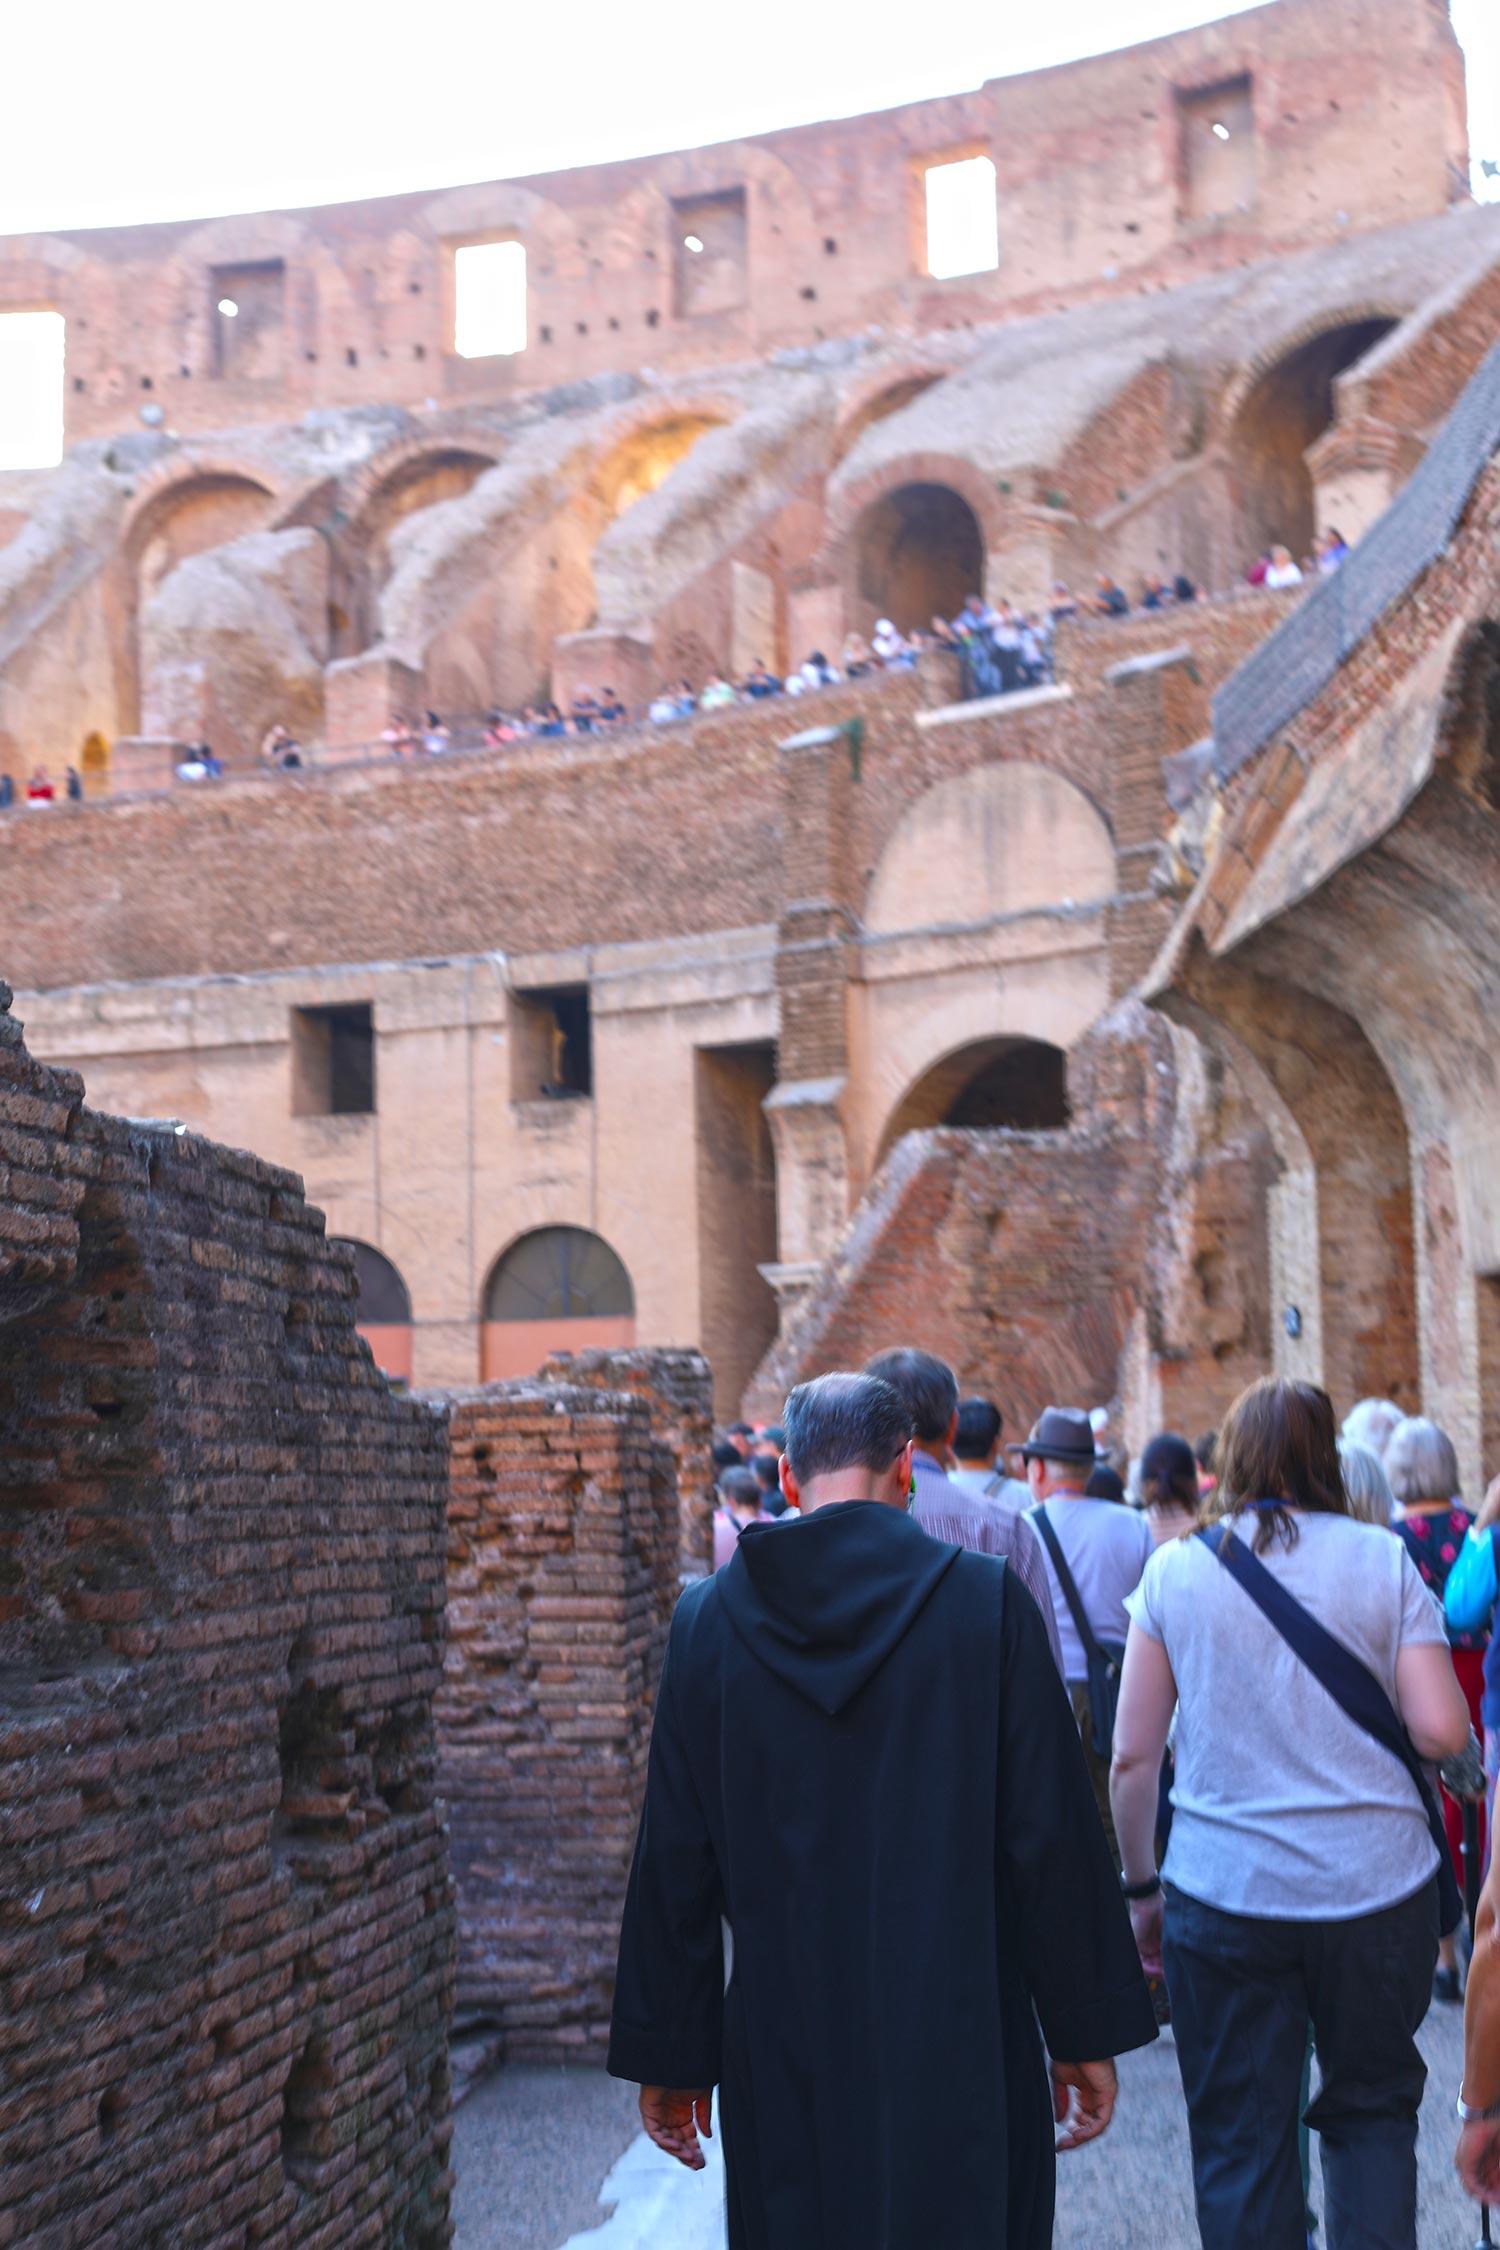 Pilgrimage_Rome_3480_Colo.jpg